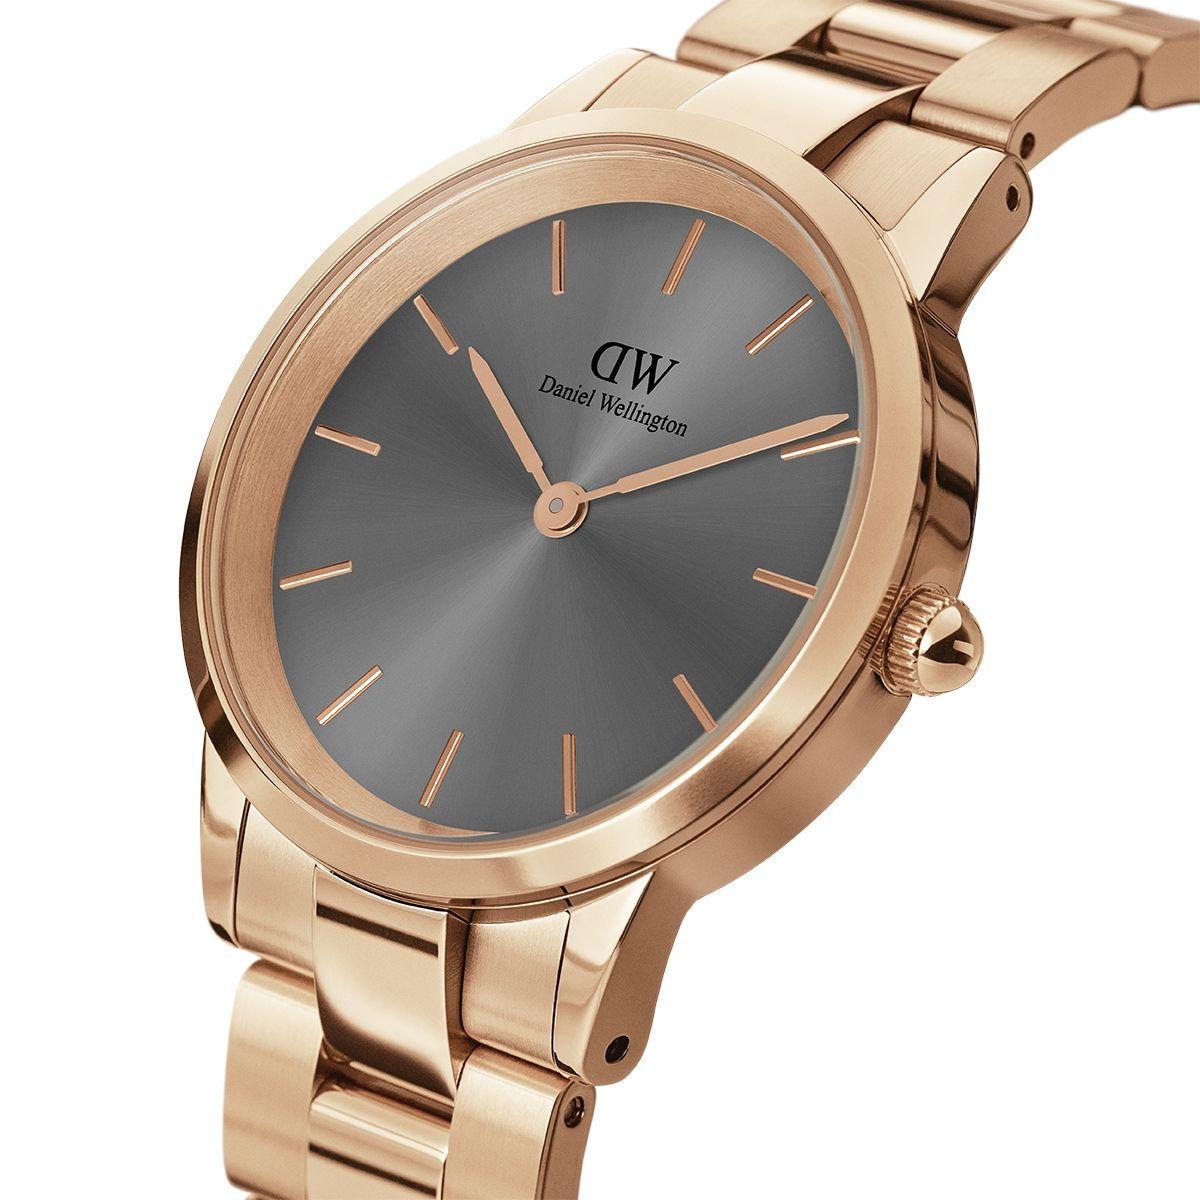 dw官网 dw手表官网 dw中国官网 dw官方旗舰店 DW DW官网  Watch Iconic Link RG Grey 28mm